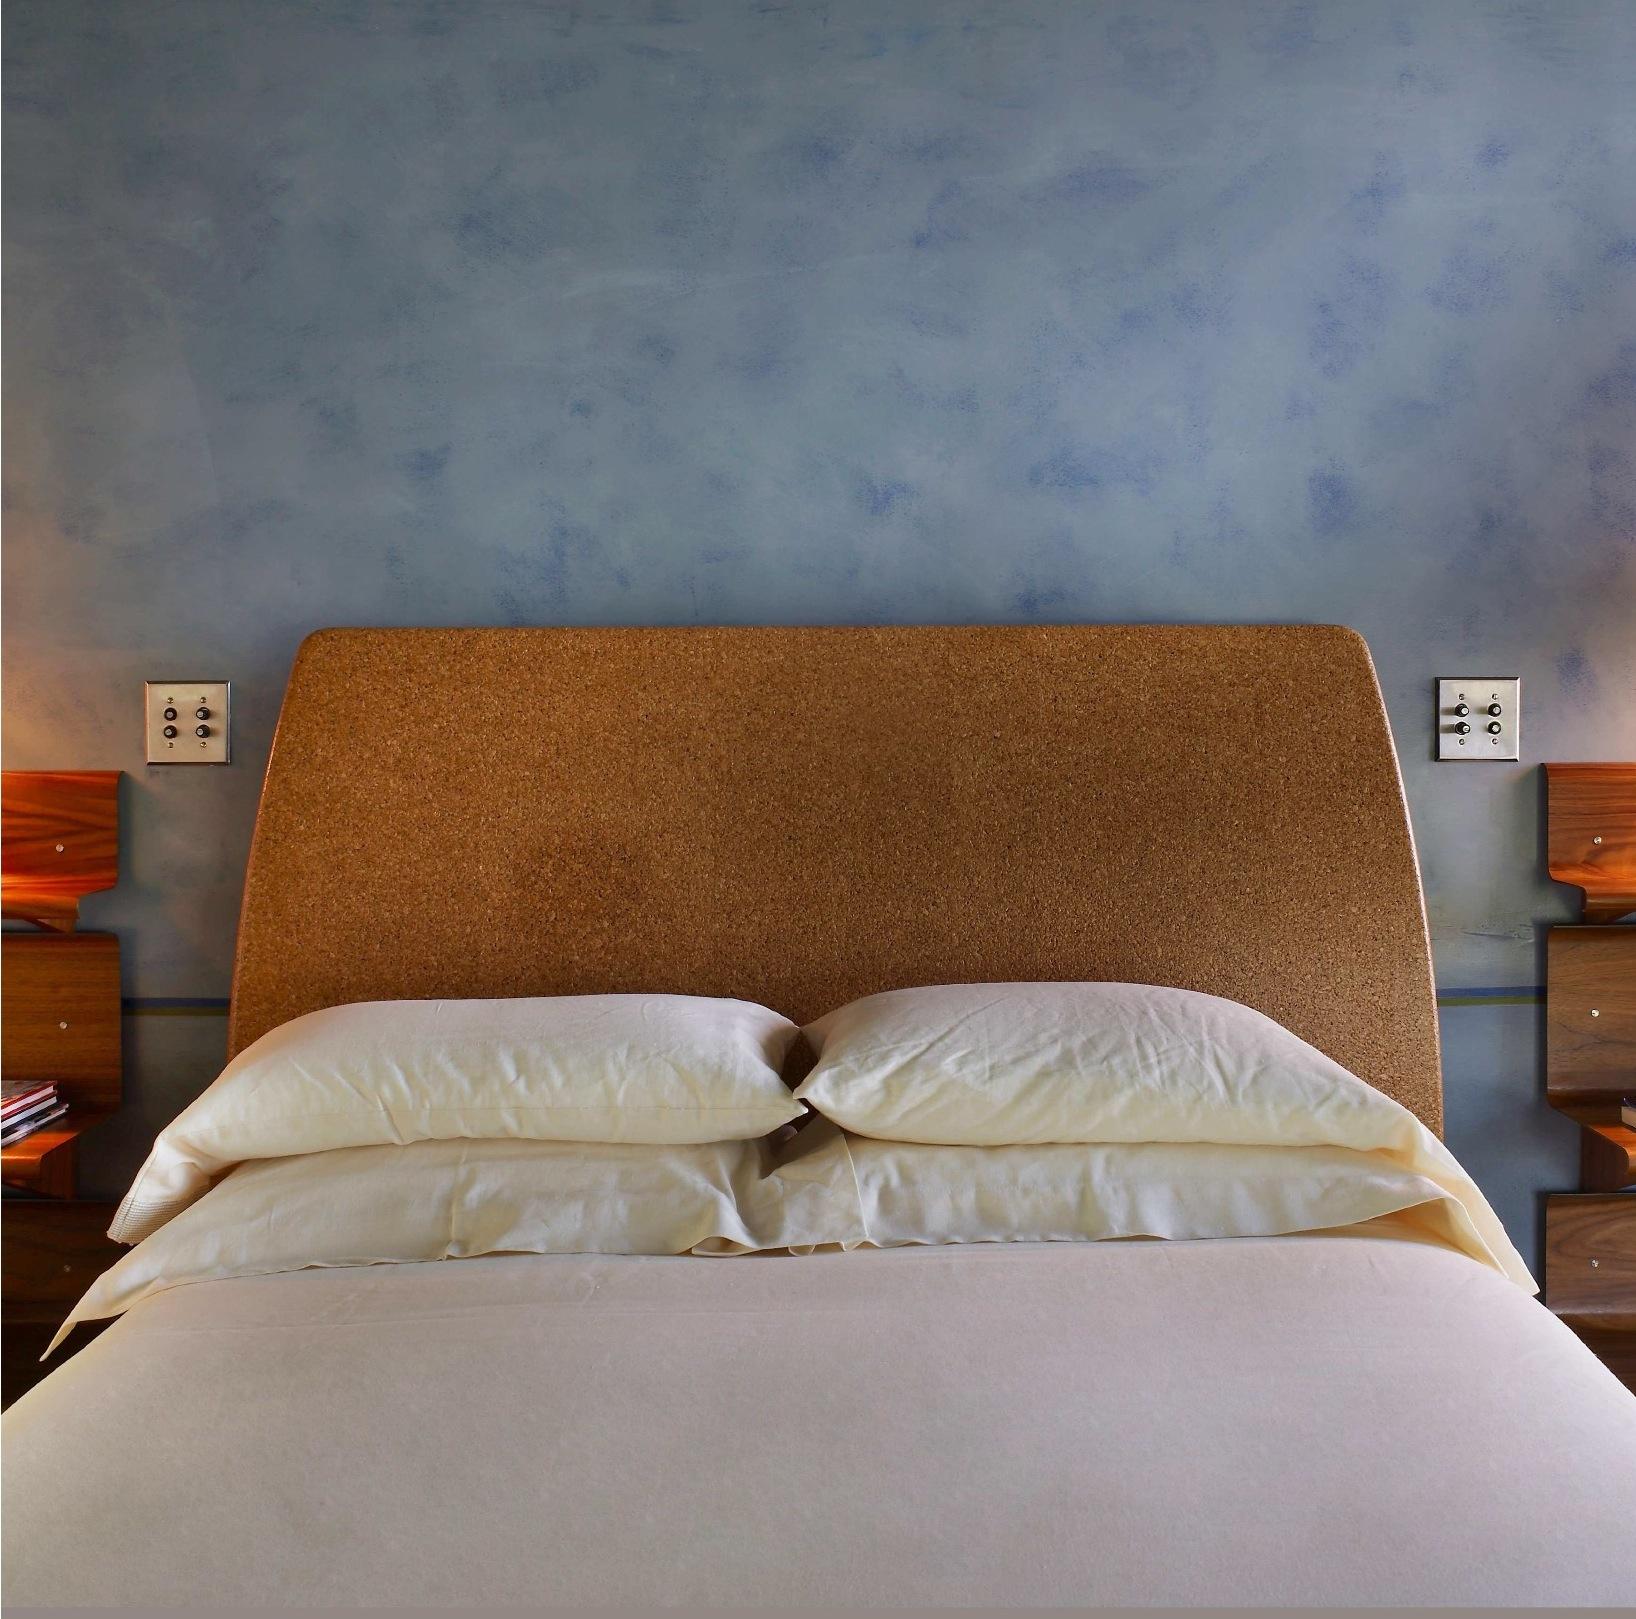 Gorelik cork bed 1.jpeg